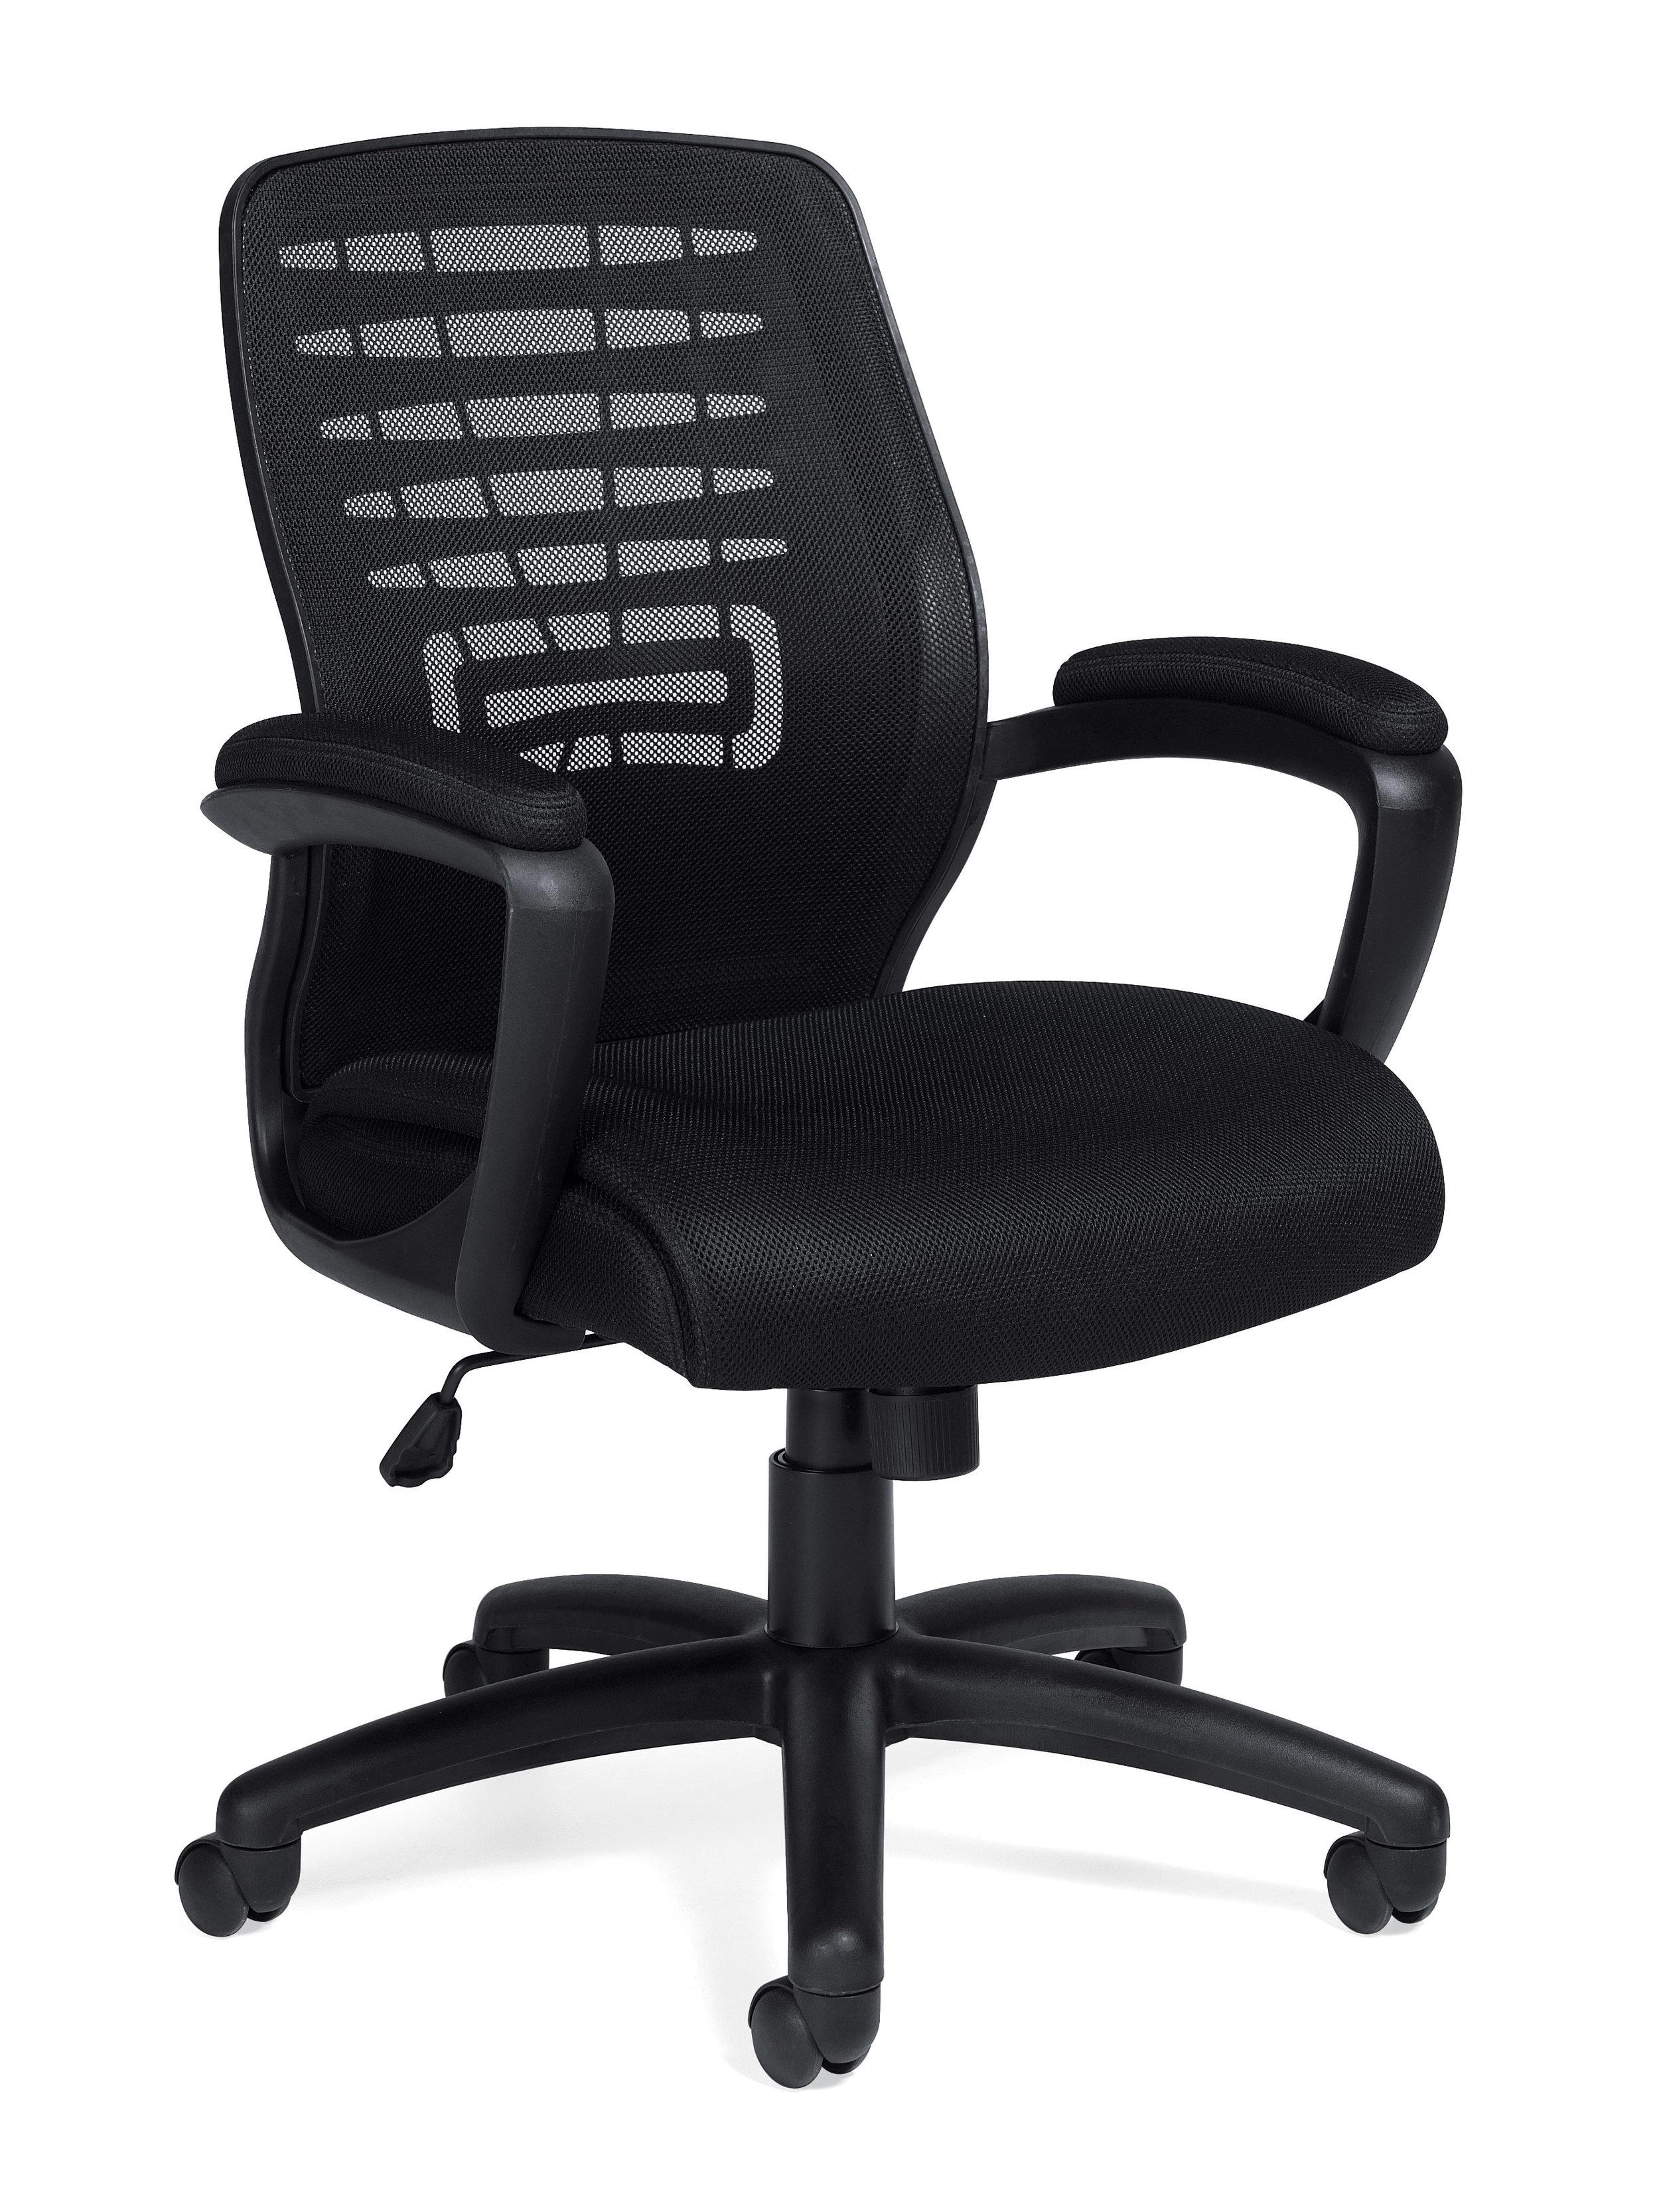 OTG11750B Mash Back Managers Chair